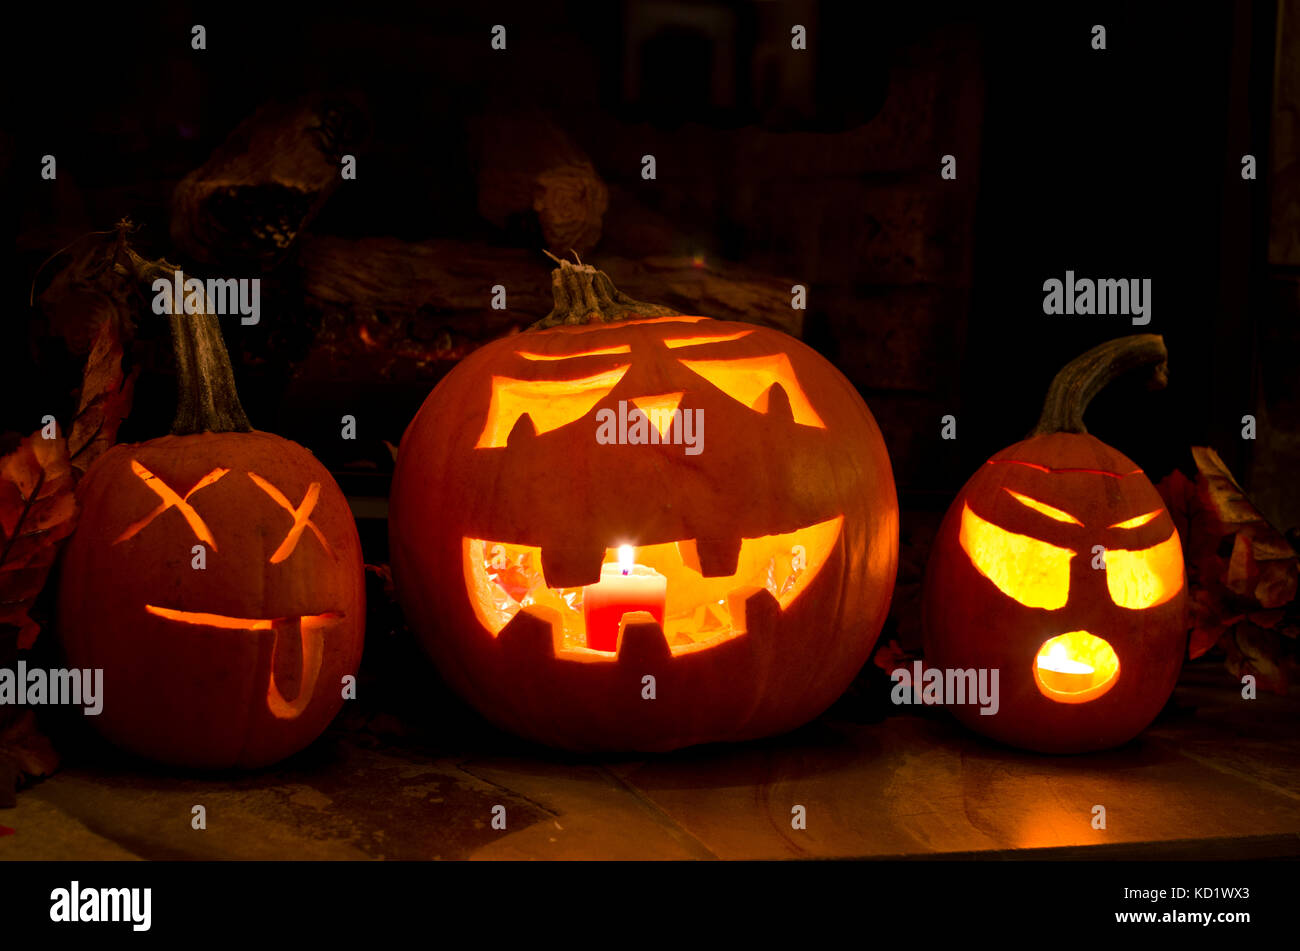 three-carved-halloween-pumpkins-jack-olanterns-at-home-pumpkin-with-KD1WX3.jpg